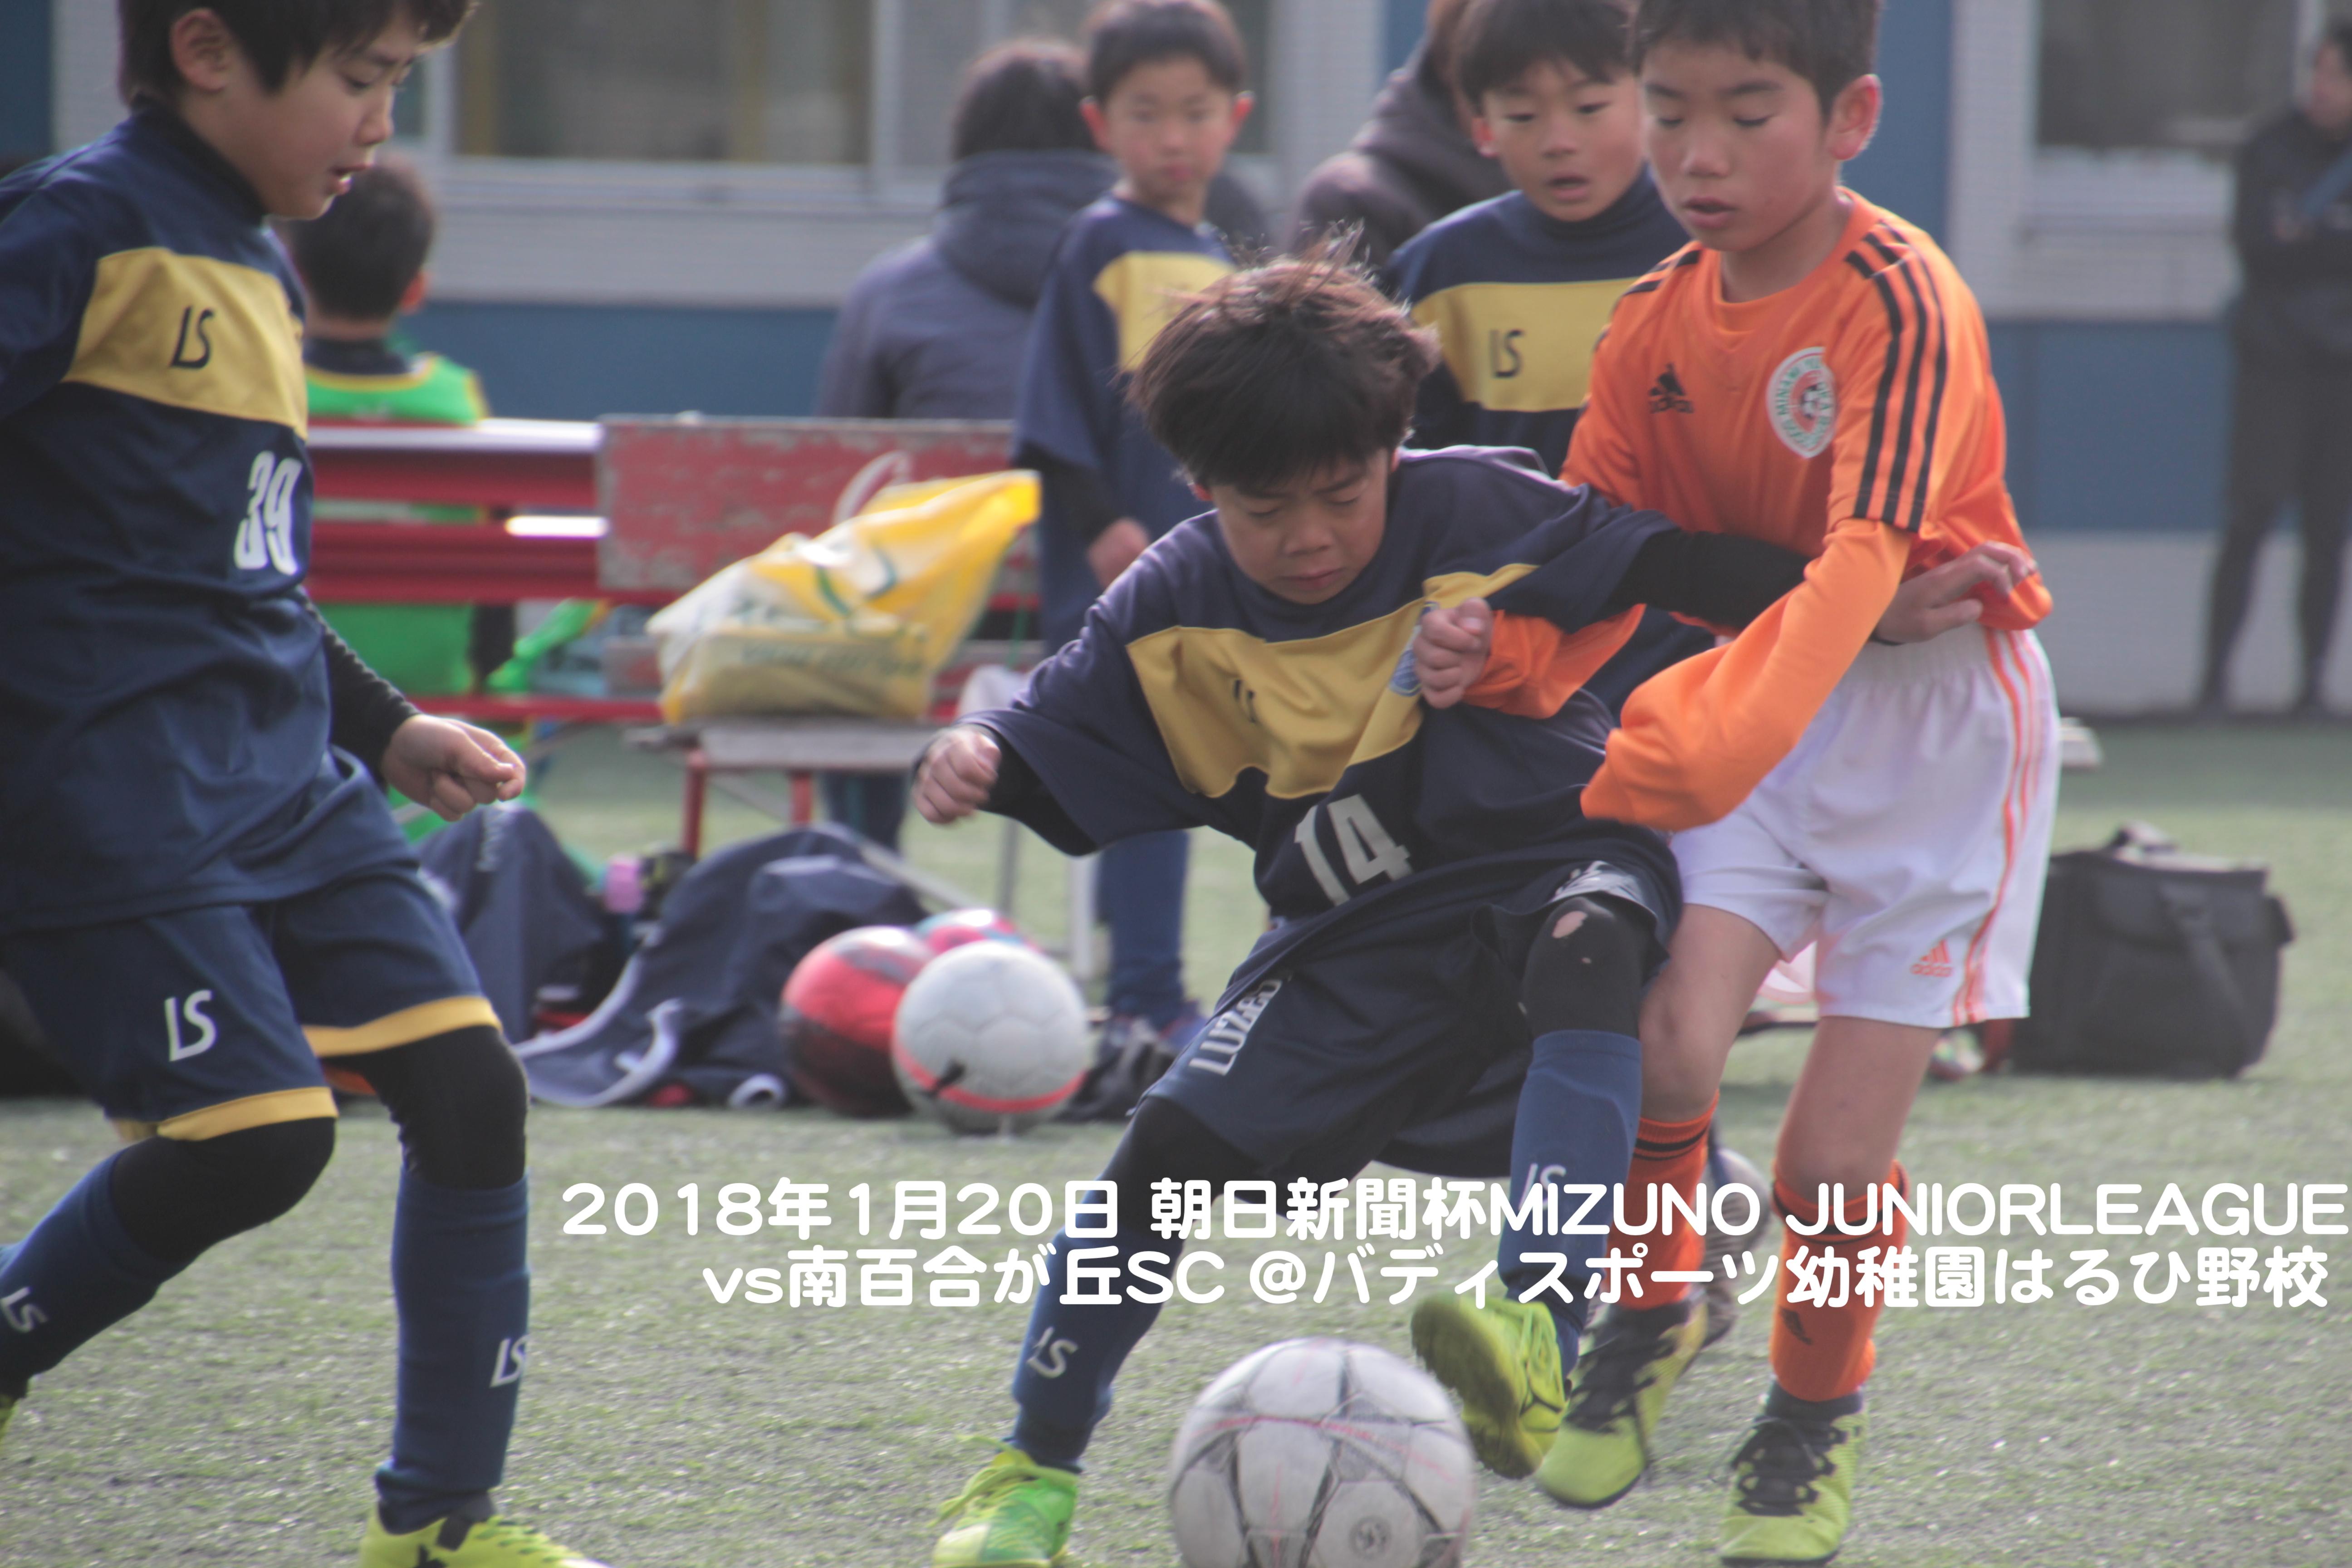 180120 Mizuno南百合